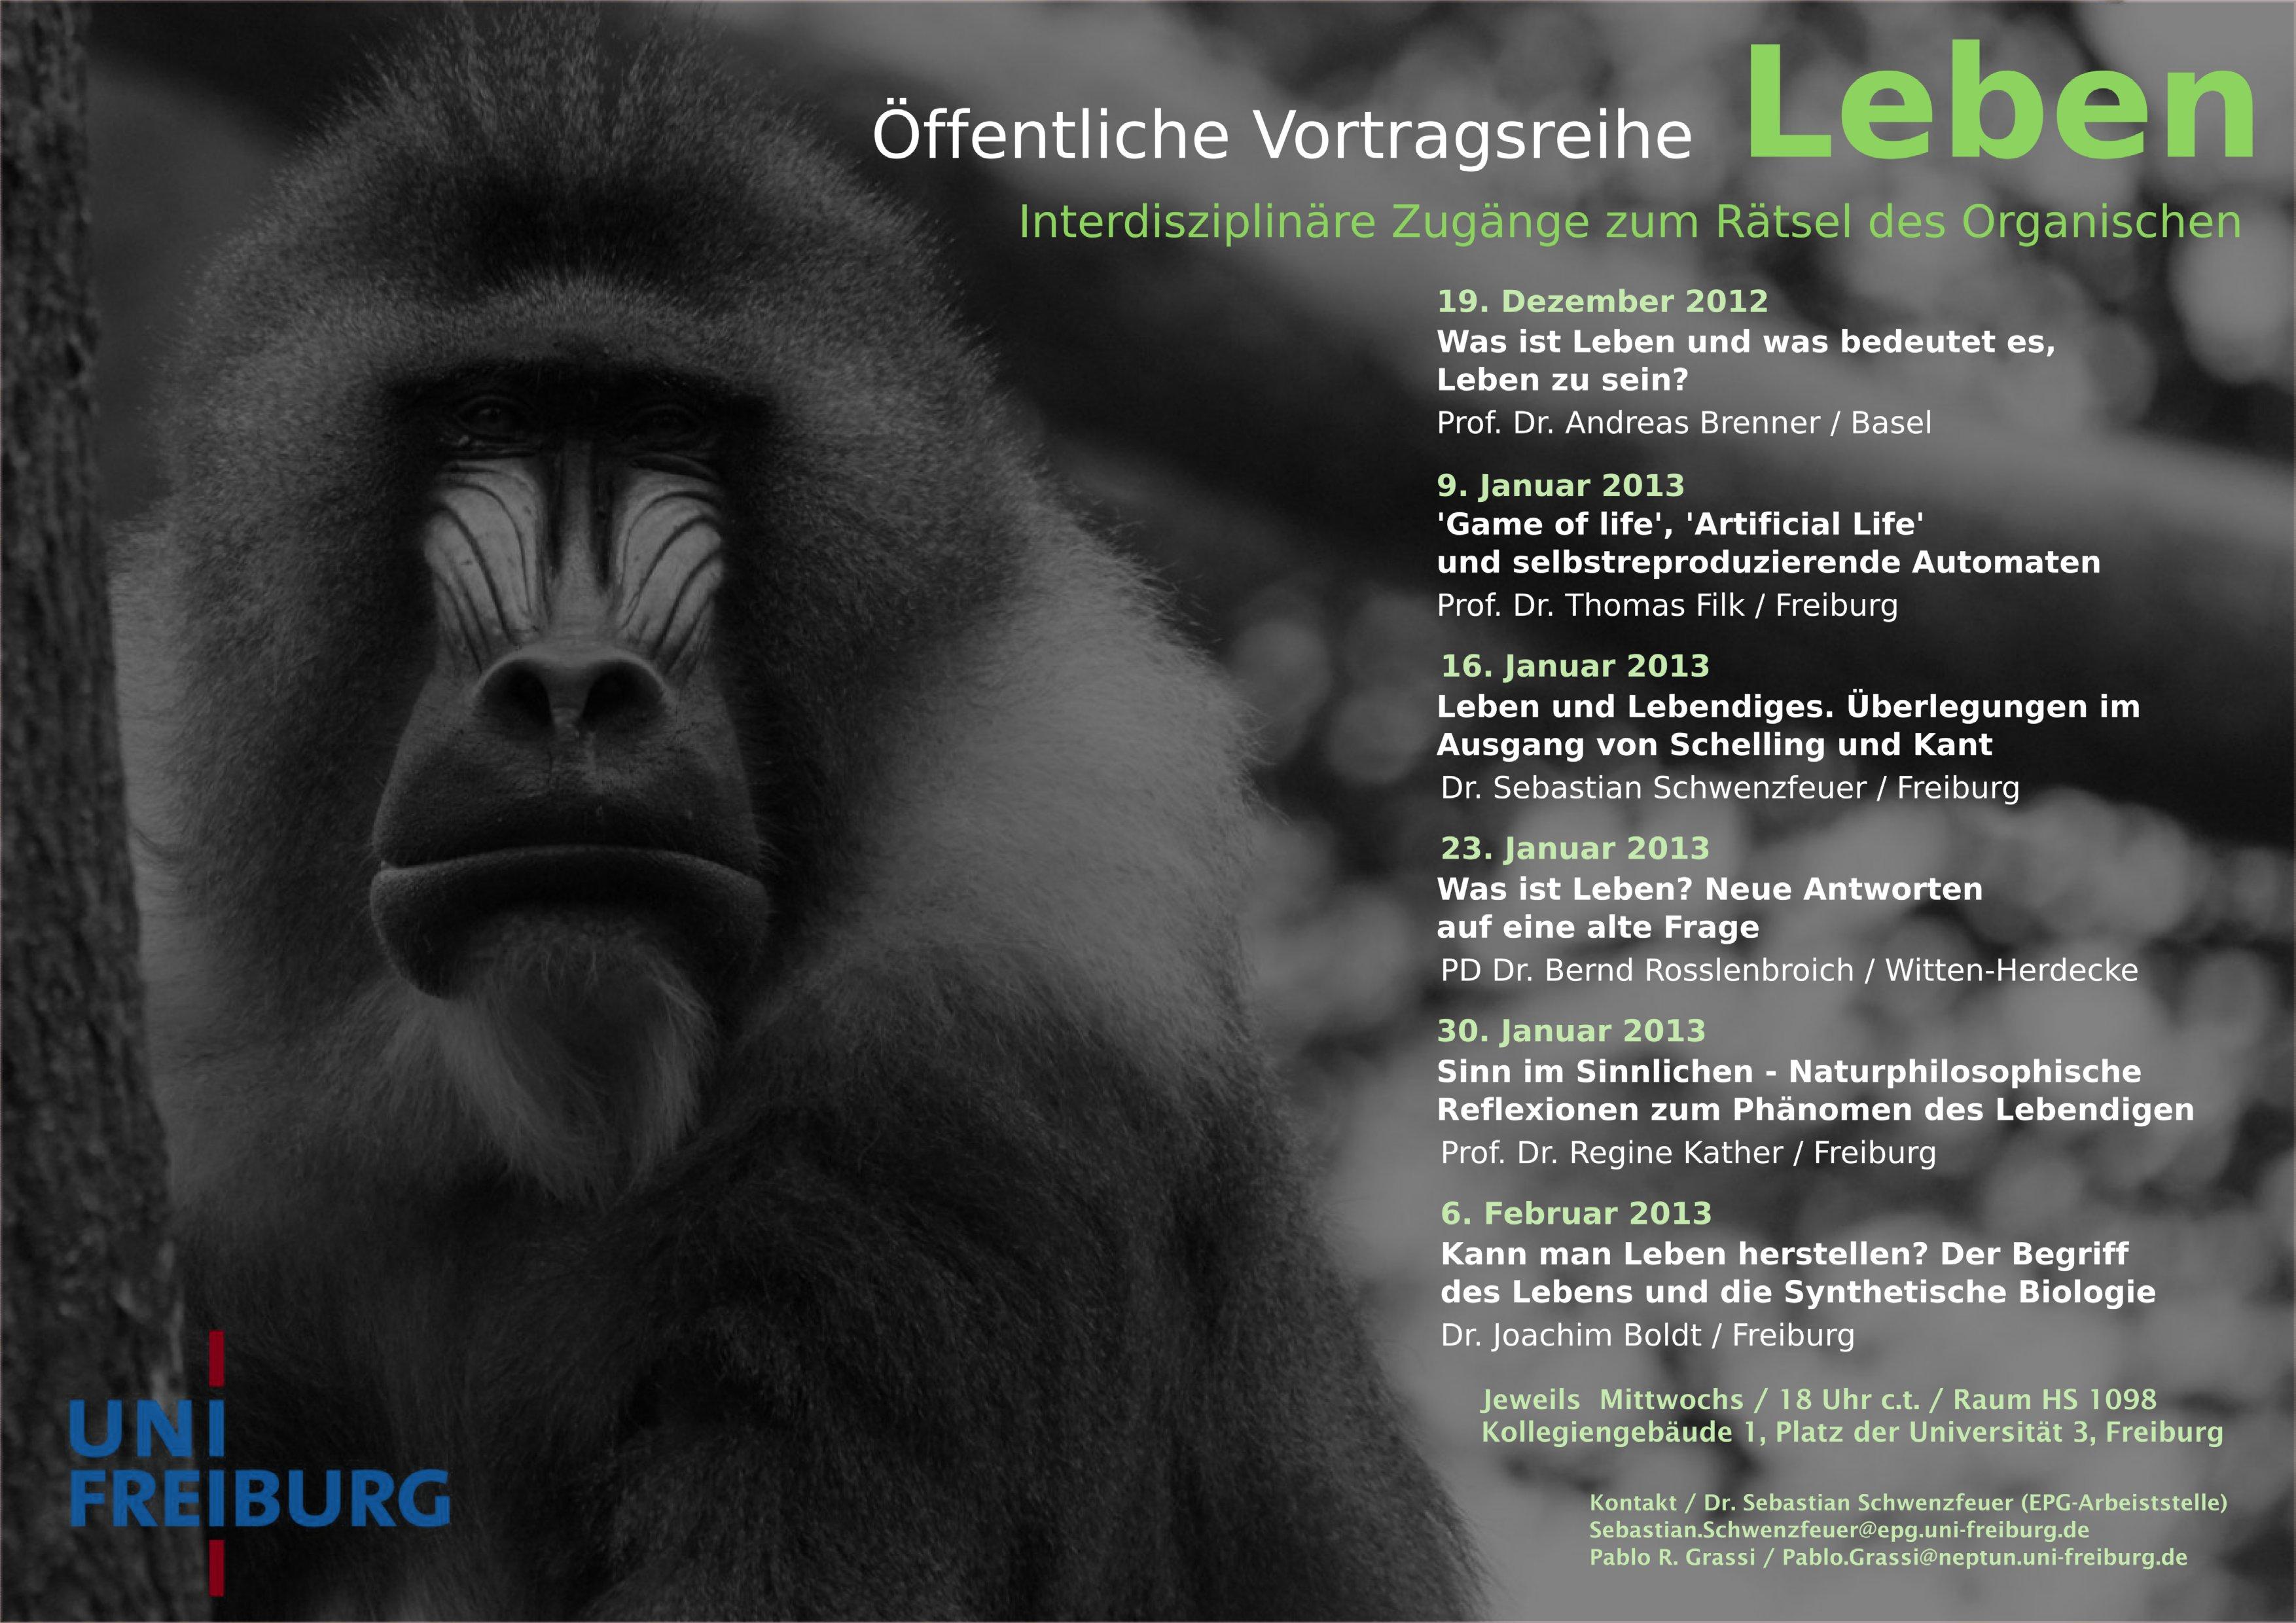 Leben - Interdisziplinäre Zugänge zum Rätsel des Organischen.jpg